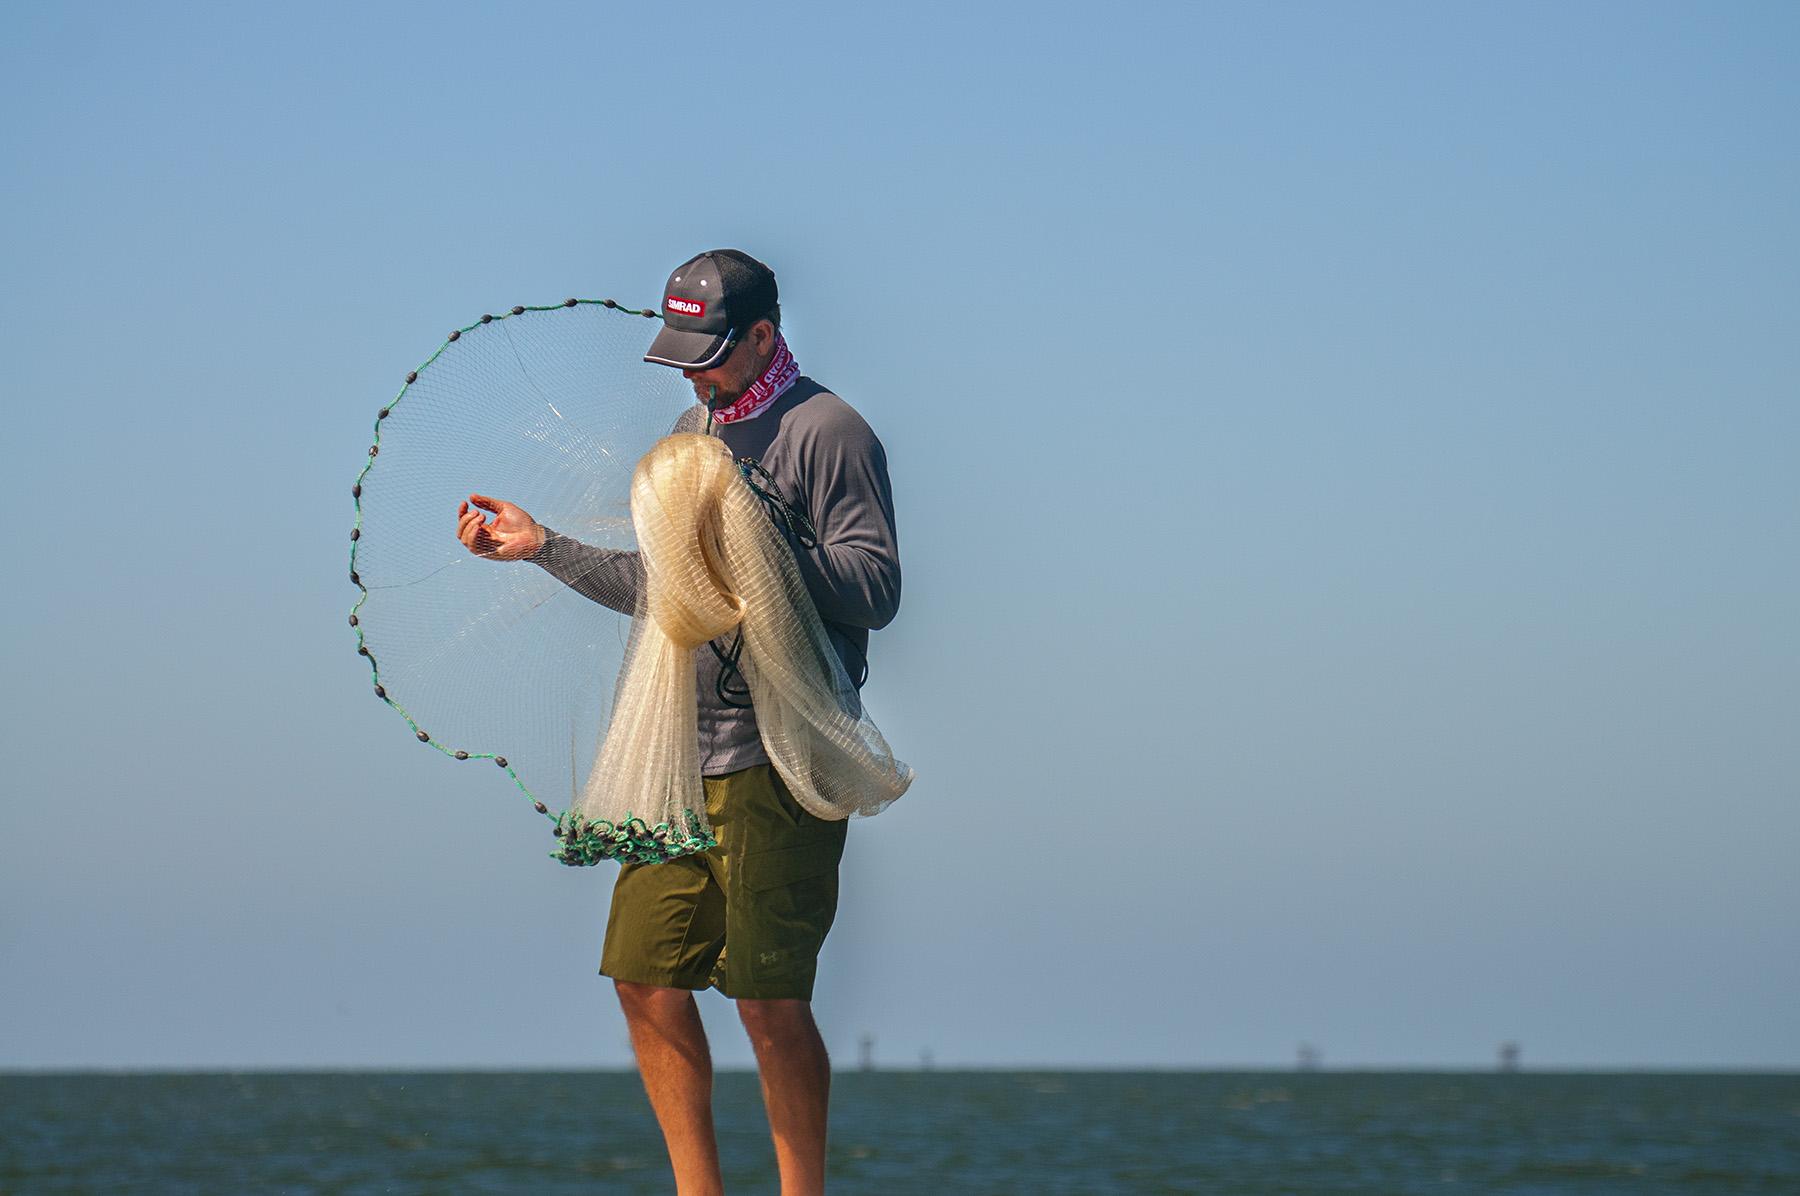 steve prepping the net. nikon d300s, 135mm, f/4.0, 1/2000 sec